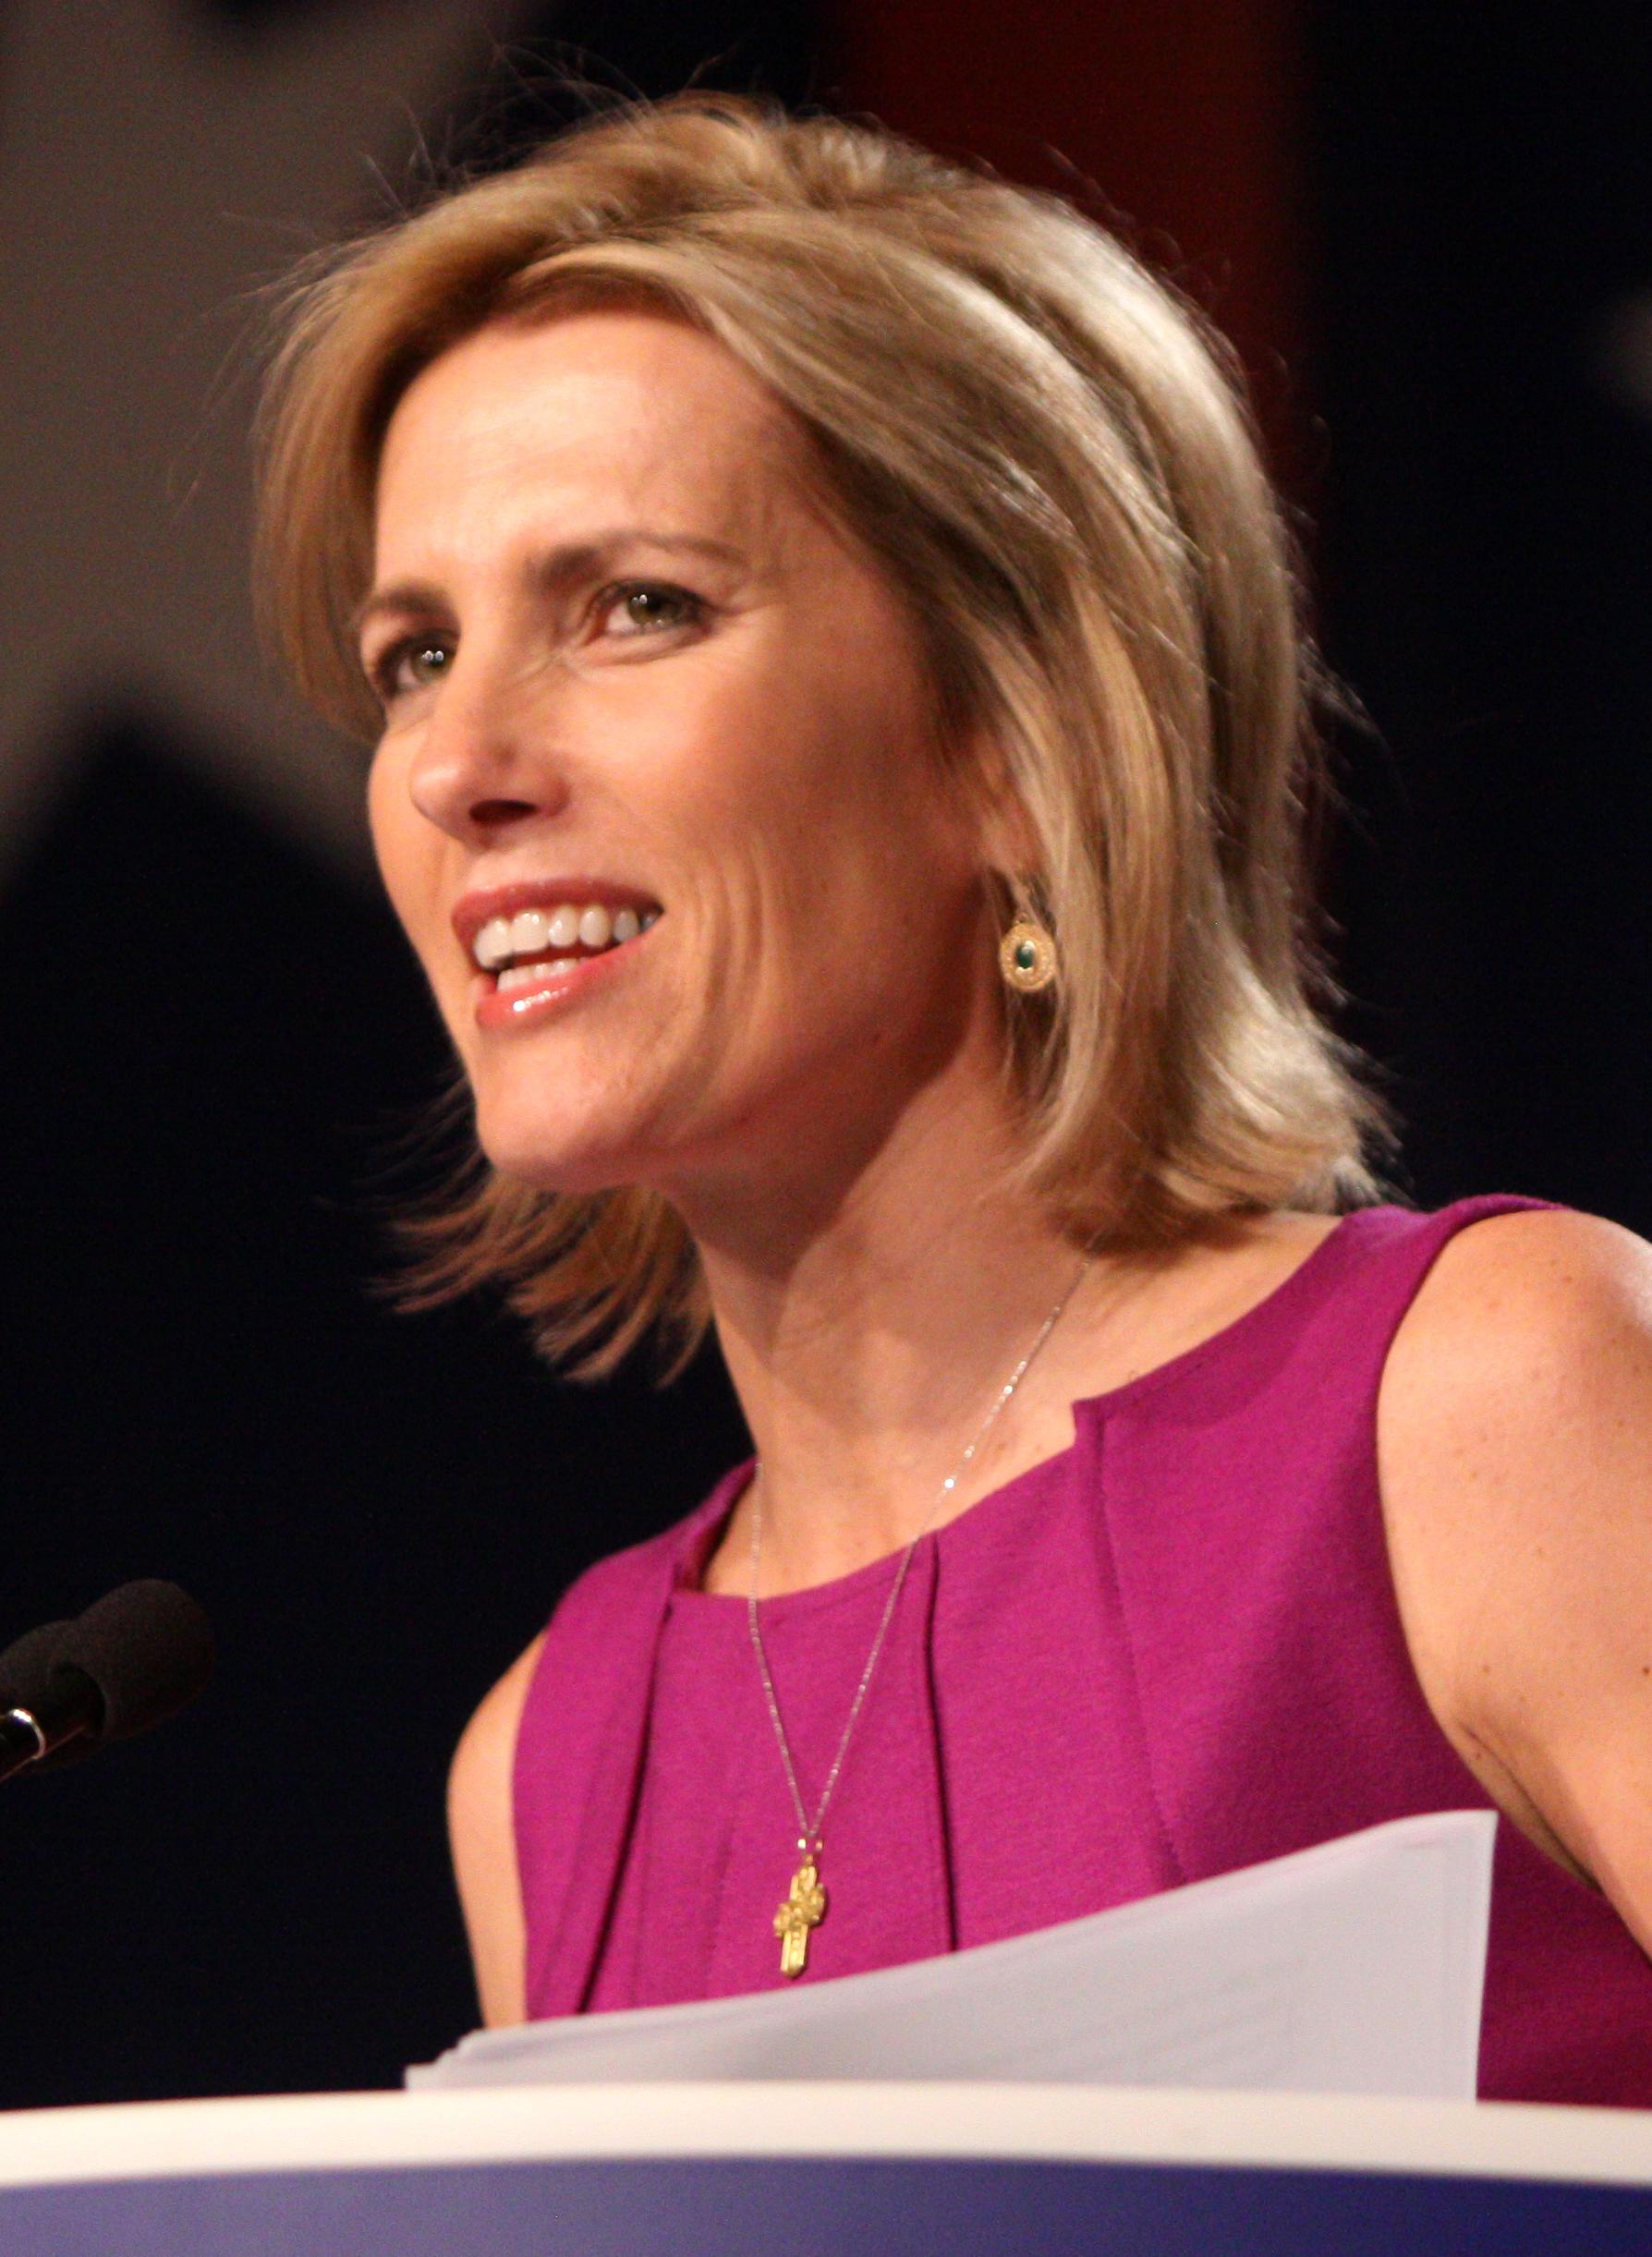 fe2fecf64b1 Laura Anne Ingraham (born June 19, 1964), American political commentator,  radio talk show host | Prabook